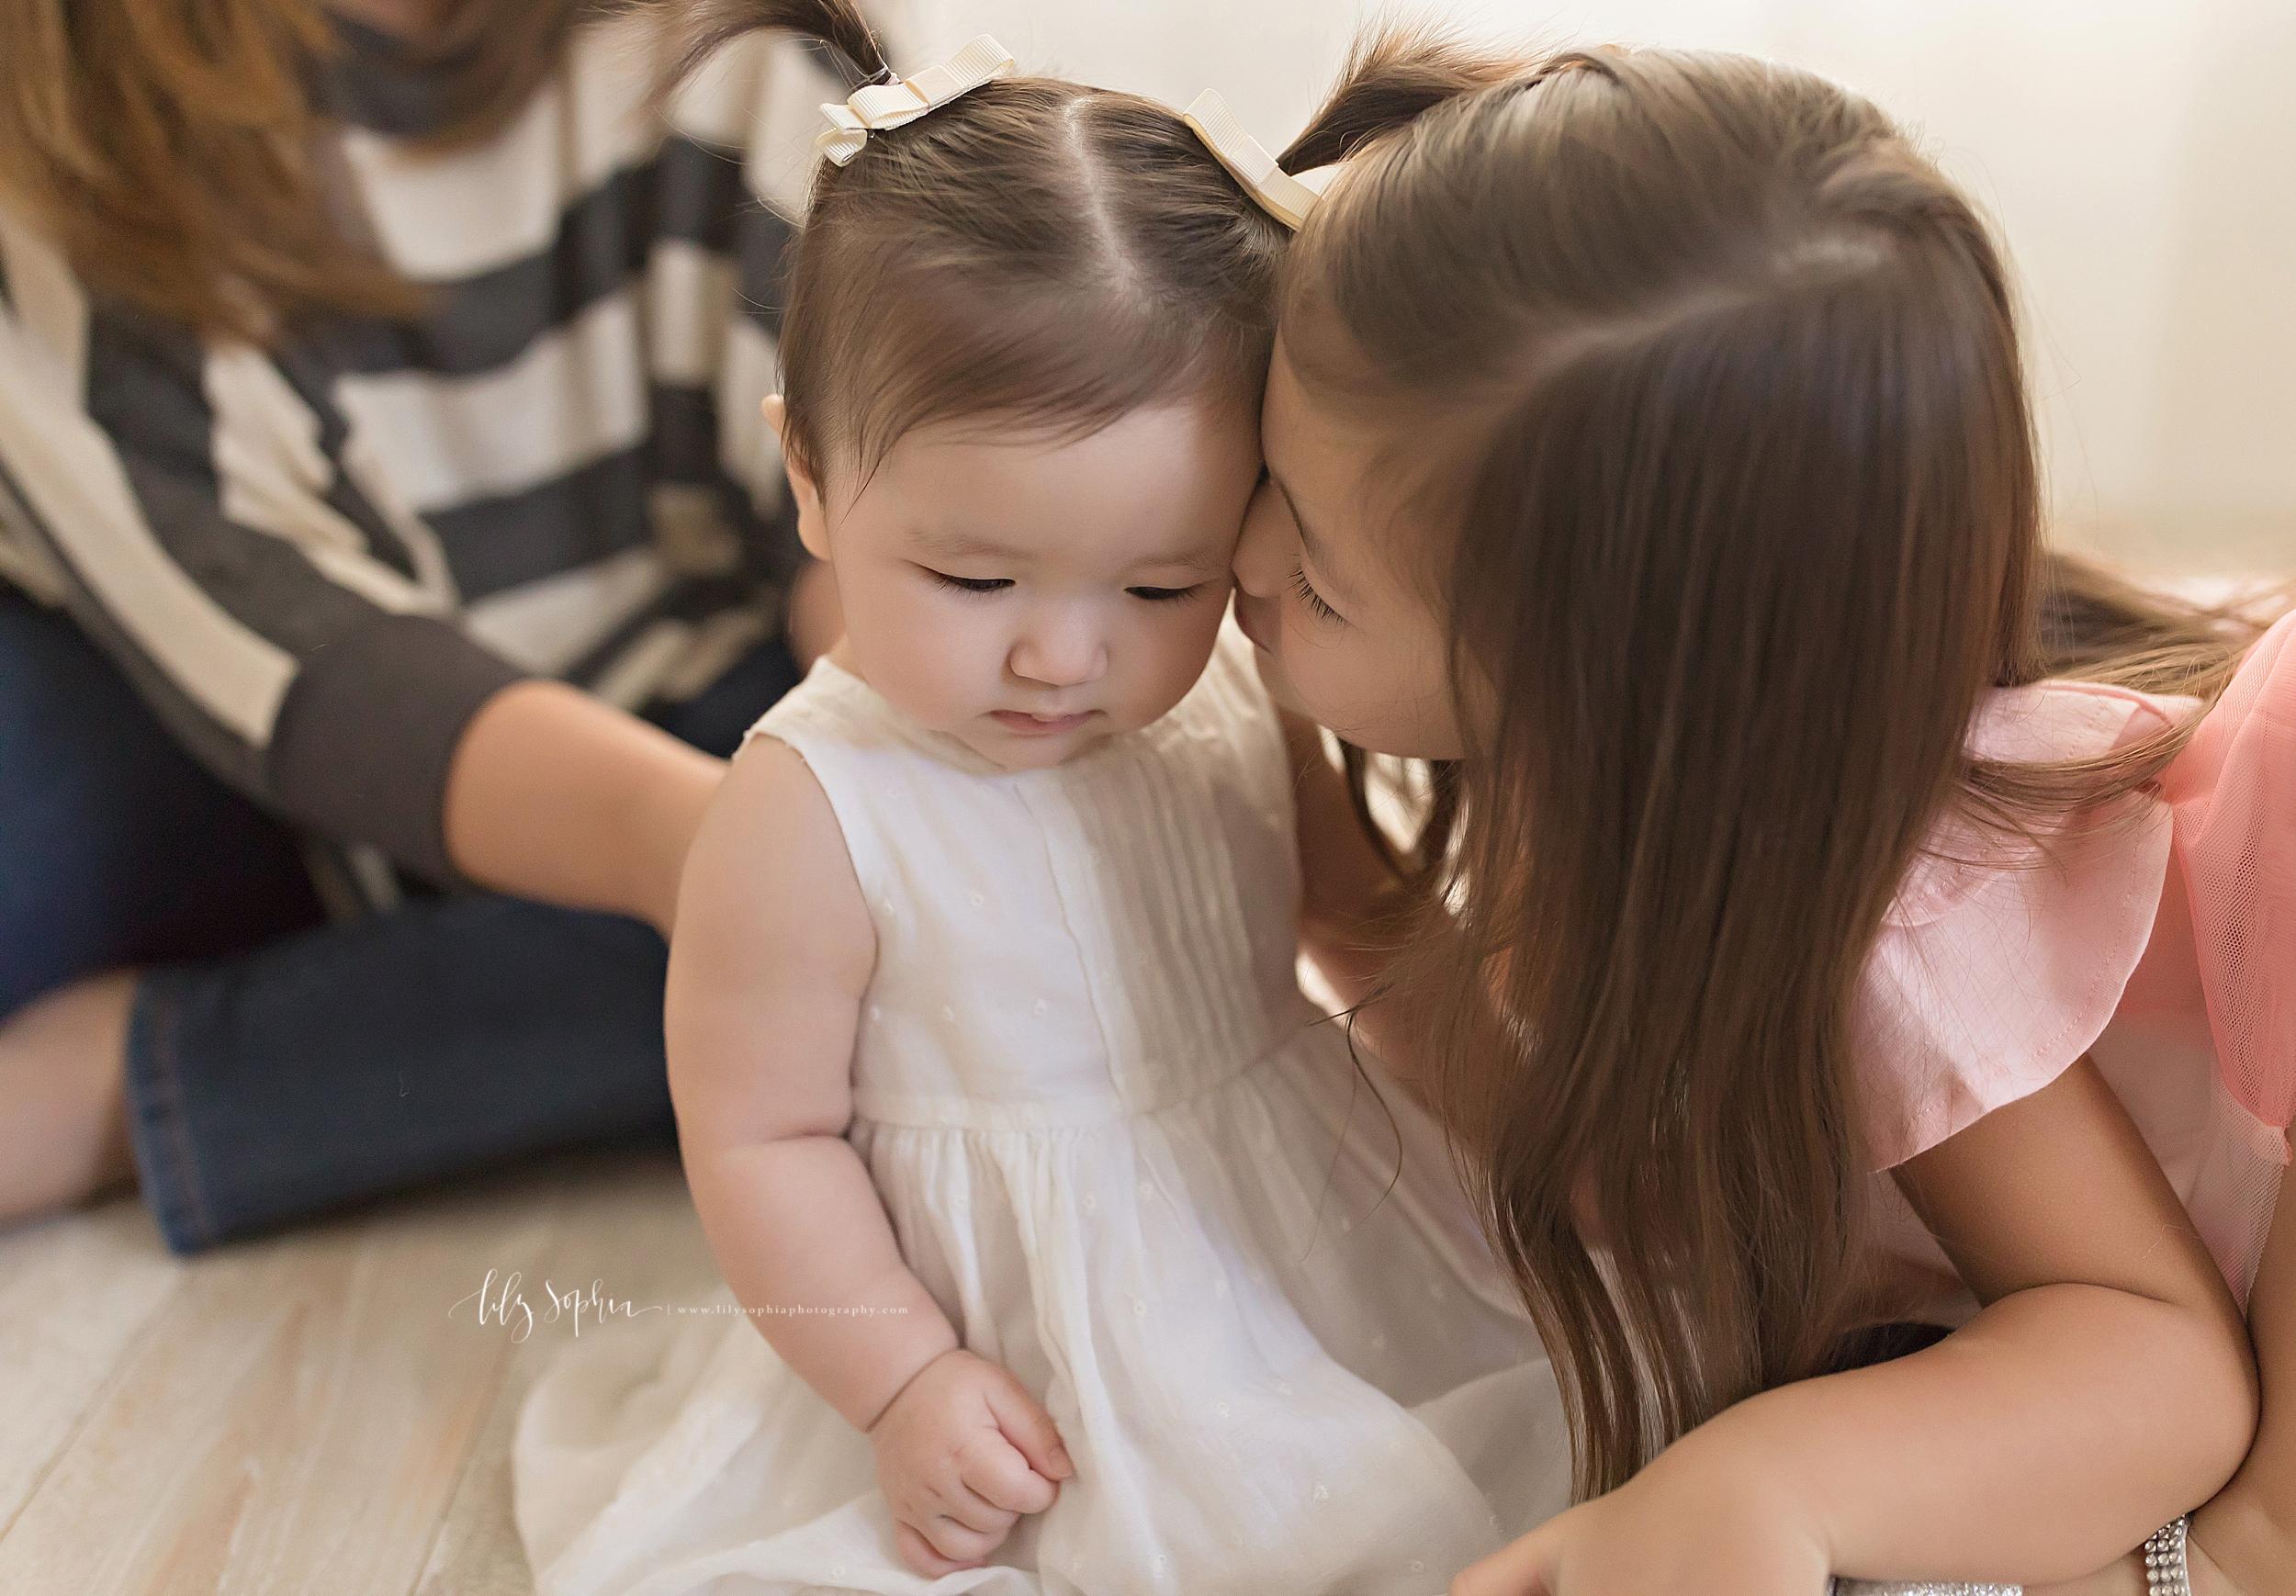 atlanta-midtown-brookhaven-decatur-lily-sophia-photography-photographer-portraits-grant-park-studio-six-month-milestone-baby-girl-big-sister-family_0127.jpg